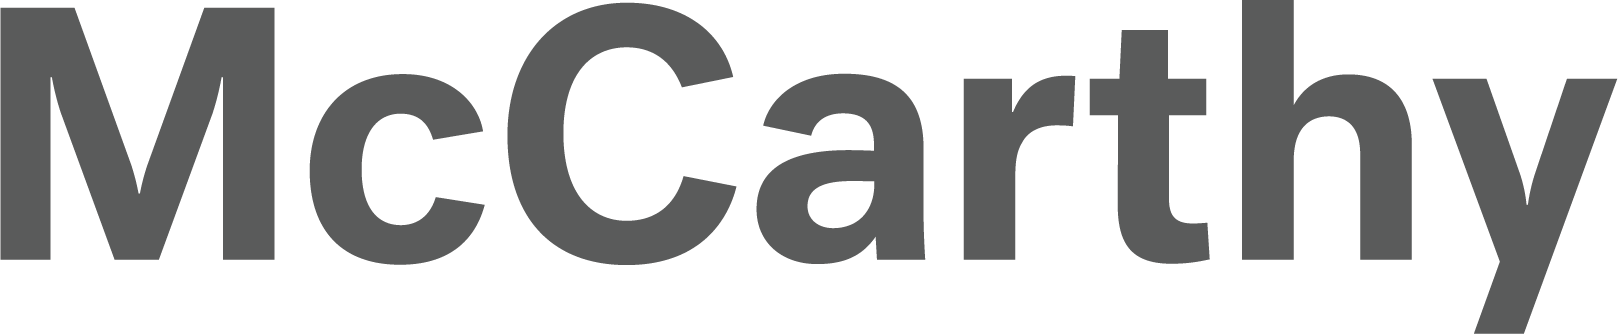 McCarthy logo